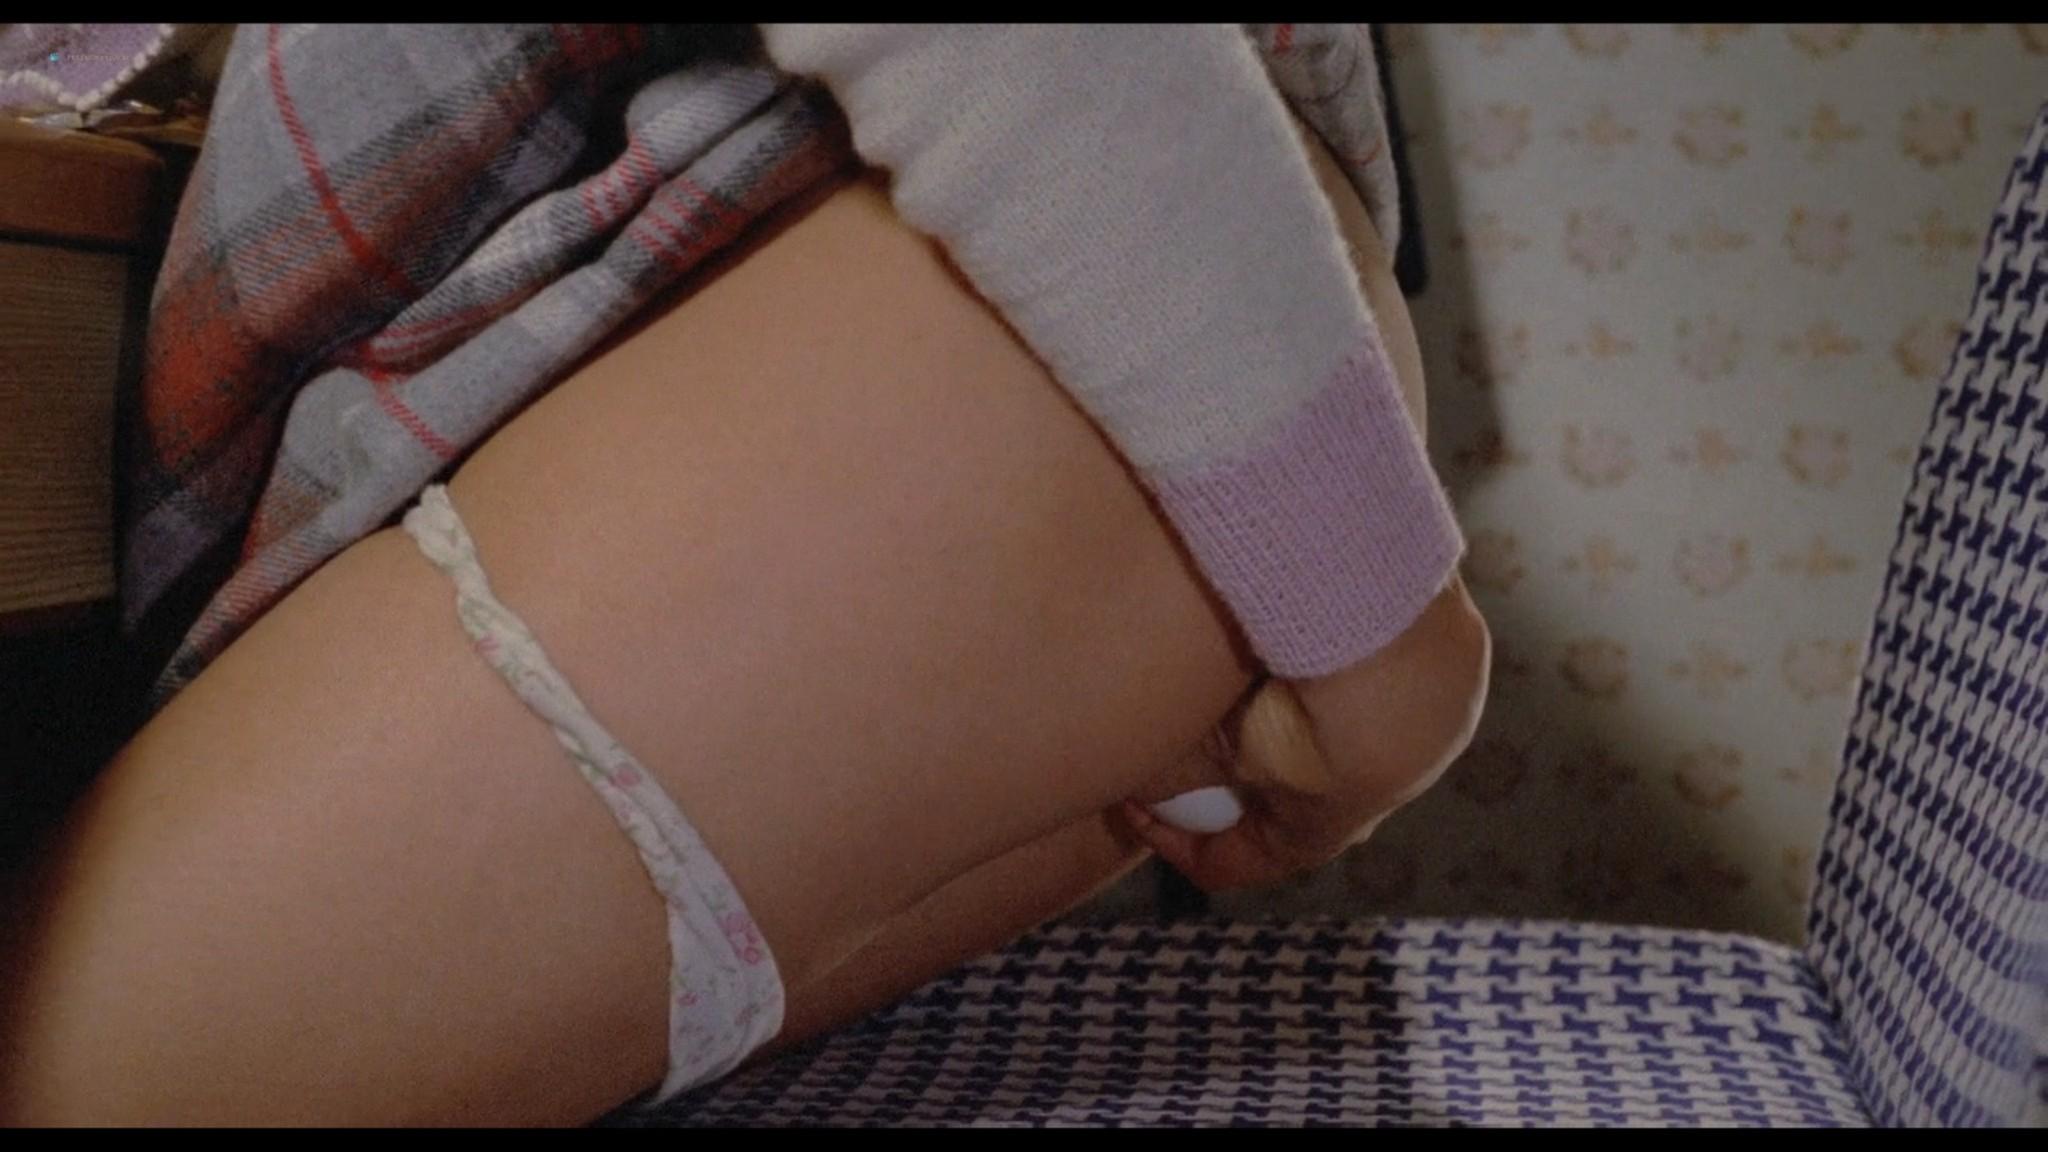 Jun Izumi nude hot sex - Angel Guts: Red Porno (JP-1981) HD 1080p BluRay (16)